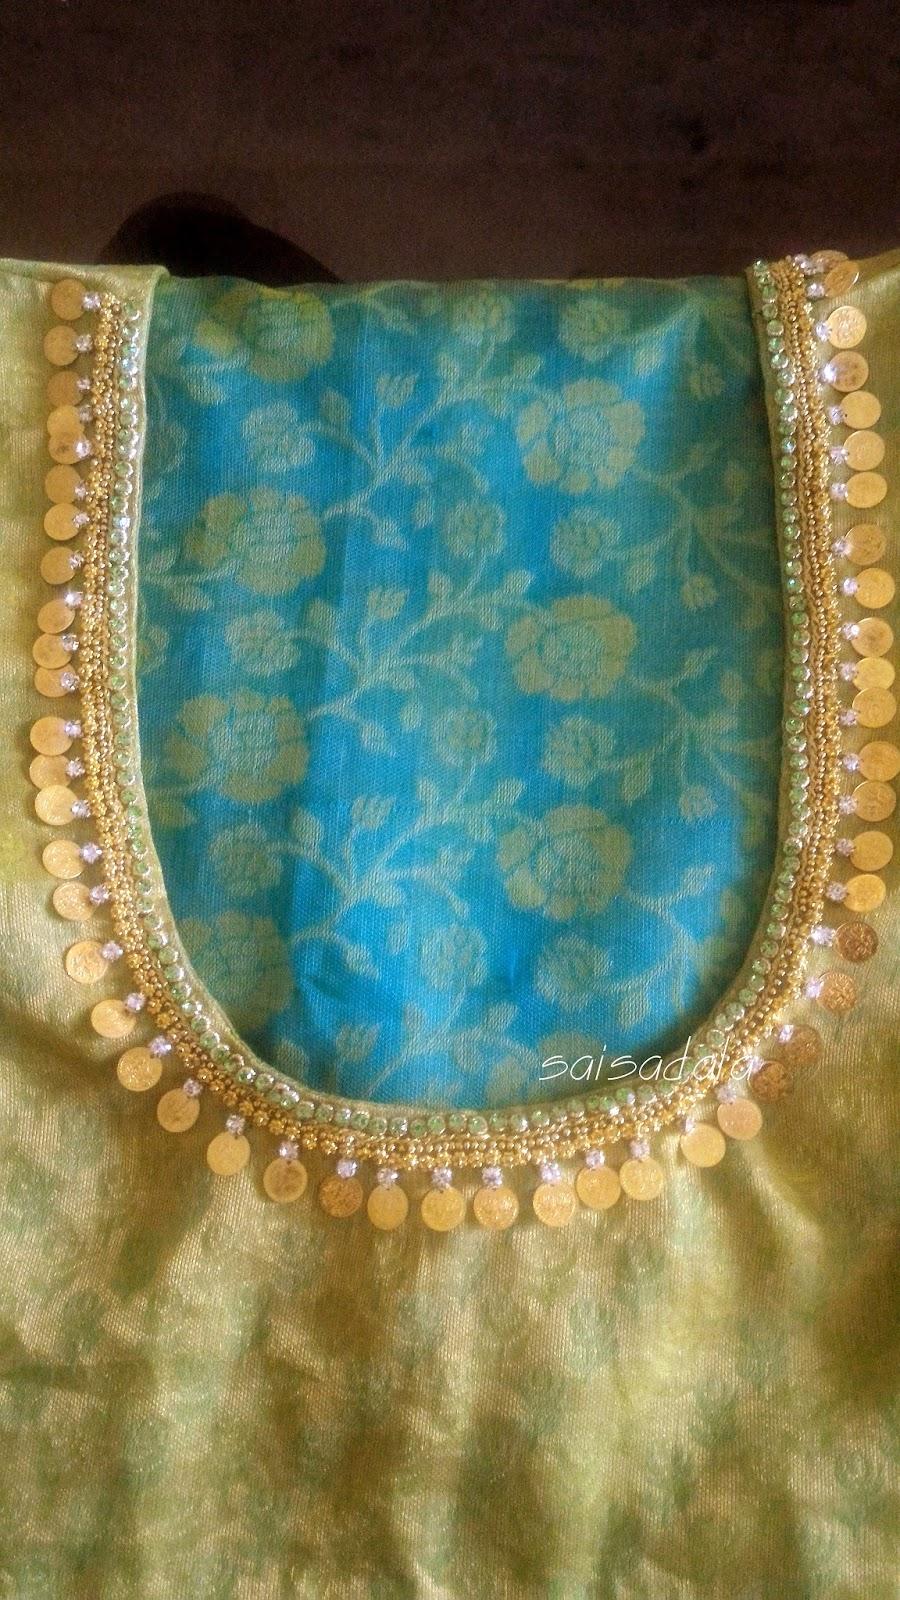 Sadala s embroidery kasu work coin